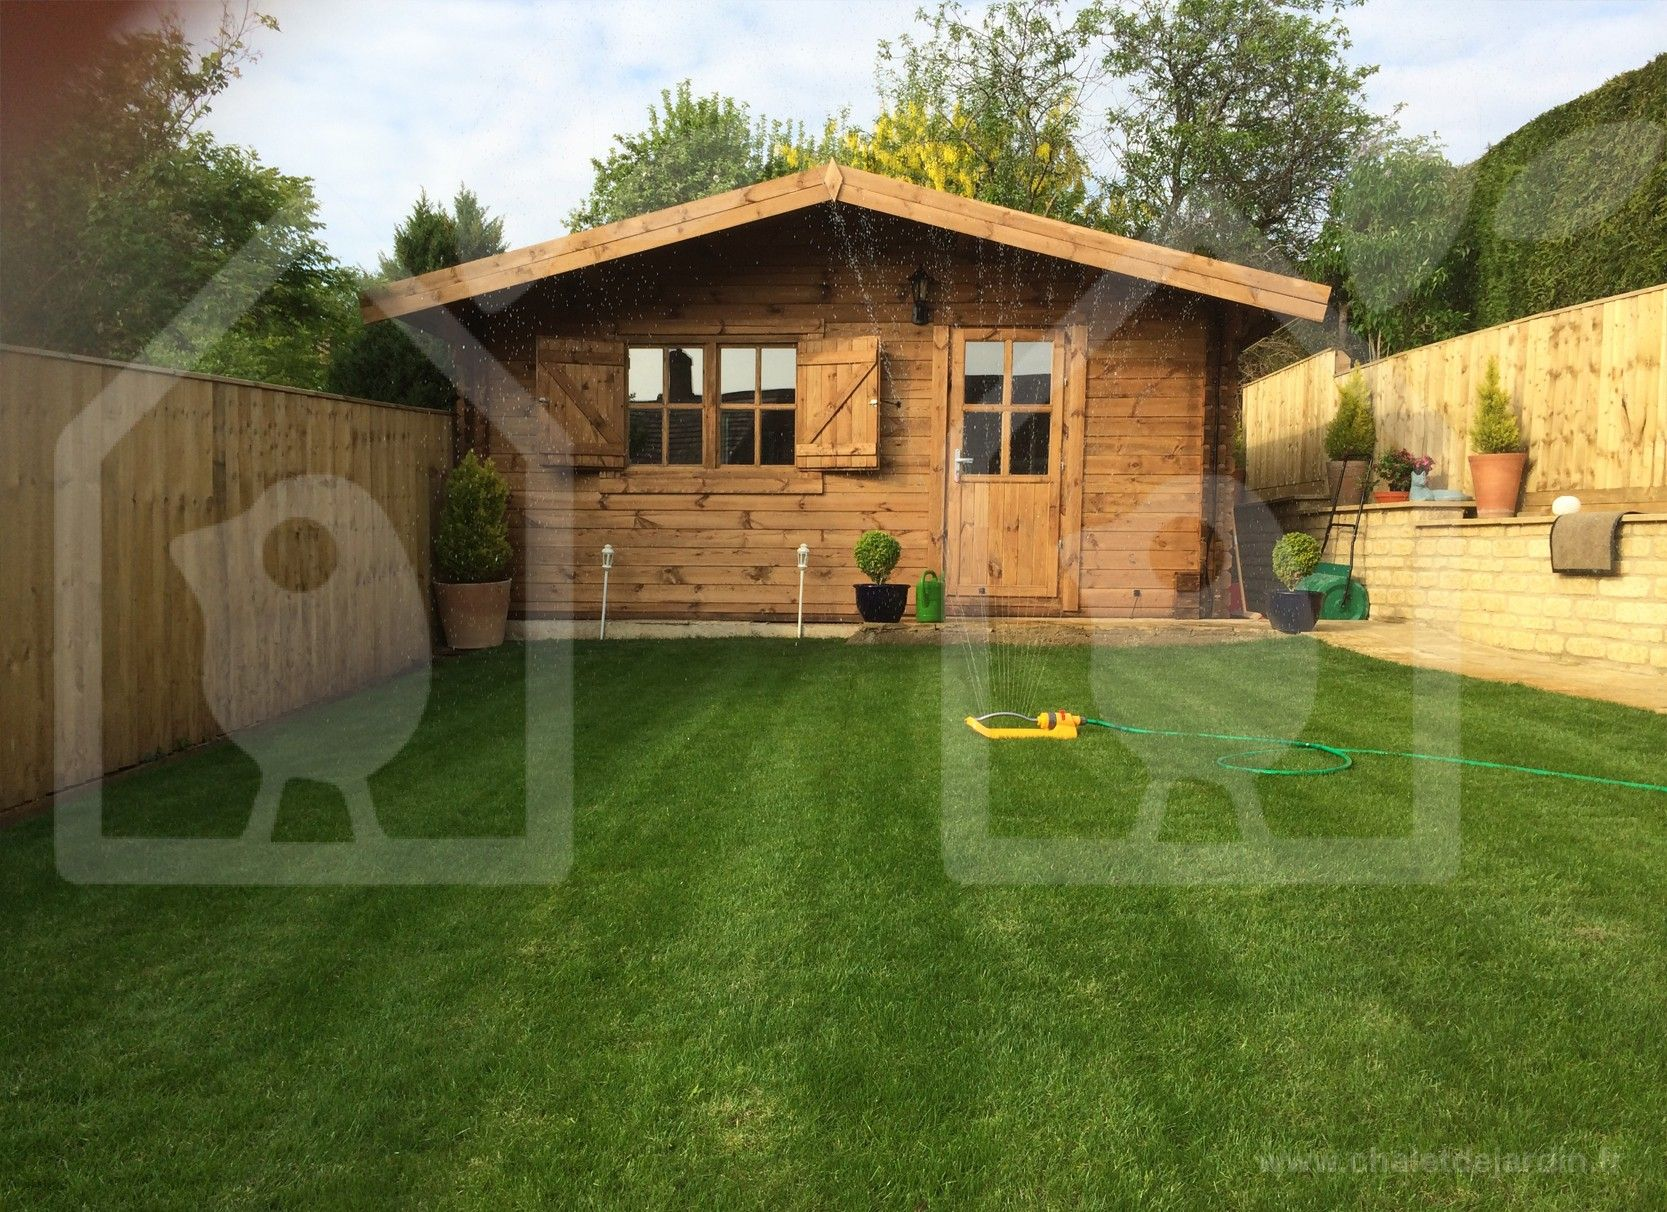 Abri de jardin NICE 36m²(6x6) 44mm (Chalet) | JARDIN | Abri de ...